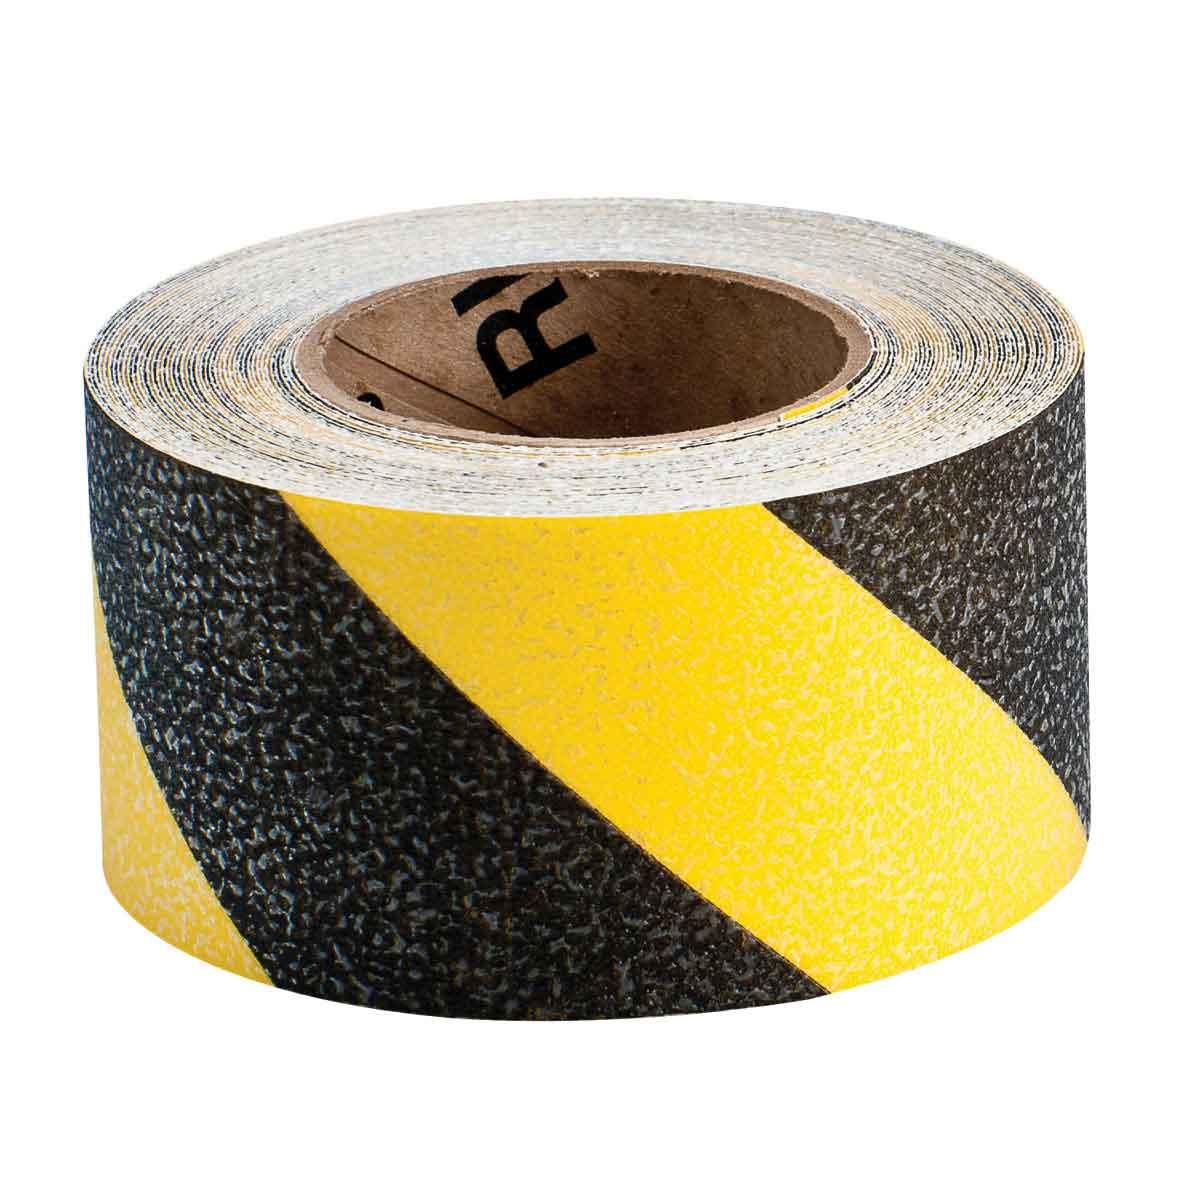 Brady® 92417 Blank Laminated Non-Reflective Anti-Skid Hazard Marking Tape, 18 yd L x 3 in W x 0.012 in THK, B-819 Vinyl, Stripes Surface Pattern